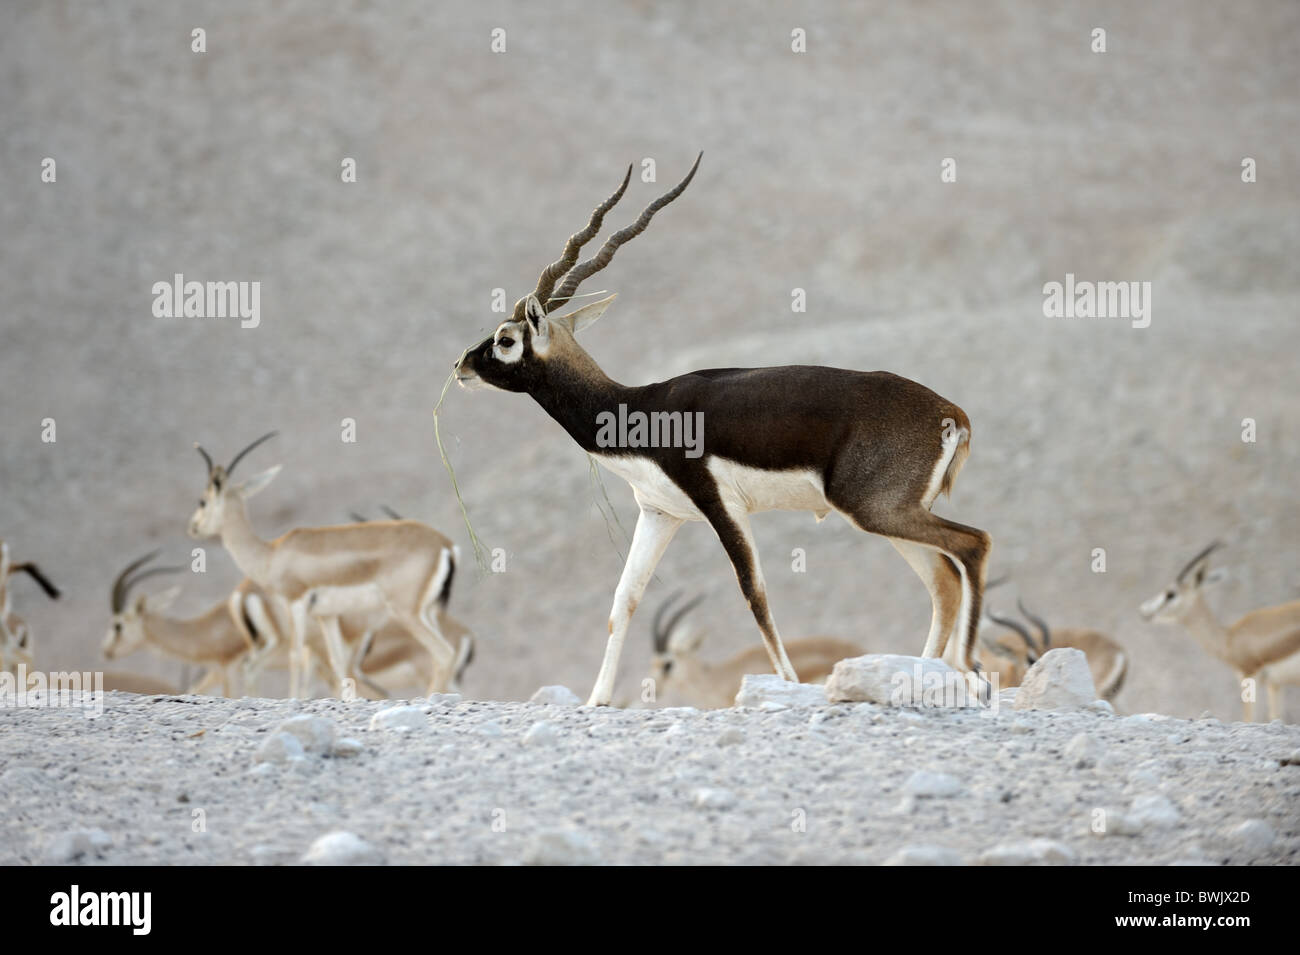 Breeding male blackbuck (Antilope cervicapra) on Sir Bani Yas Island Wildlife Reserve, Abu Dhabi - Stock Image